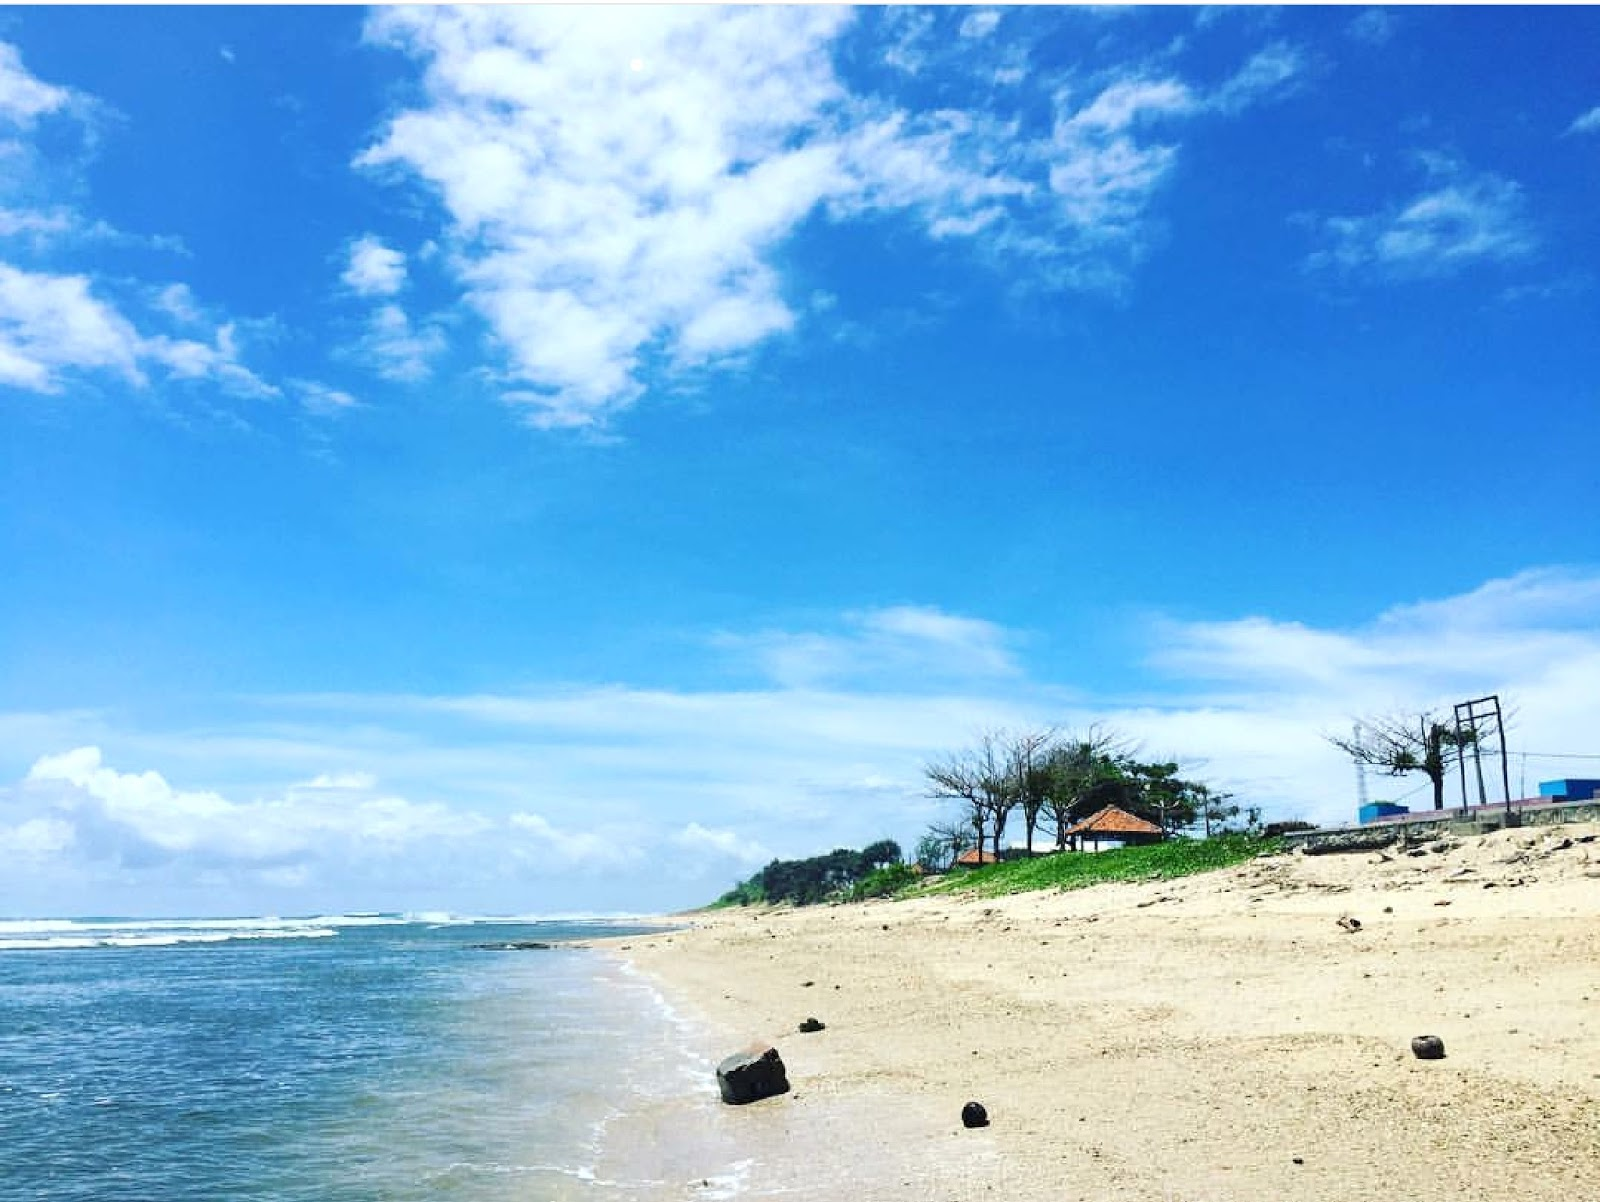 11 Gambar Pantai Sayang Heulang Garut Jawa Barat, Penginapan dan Tiket Masuk